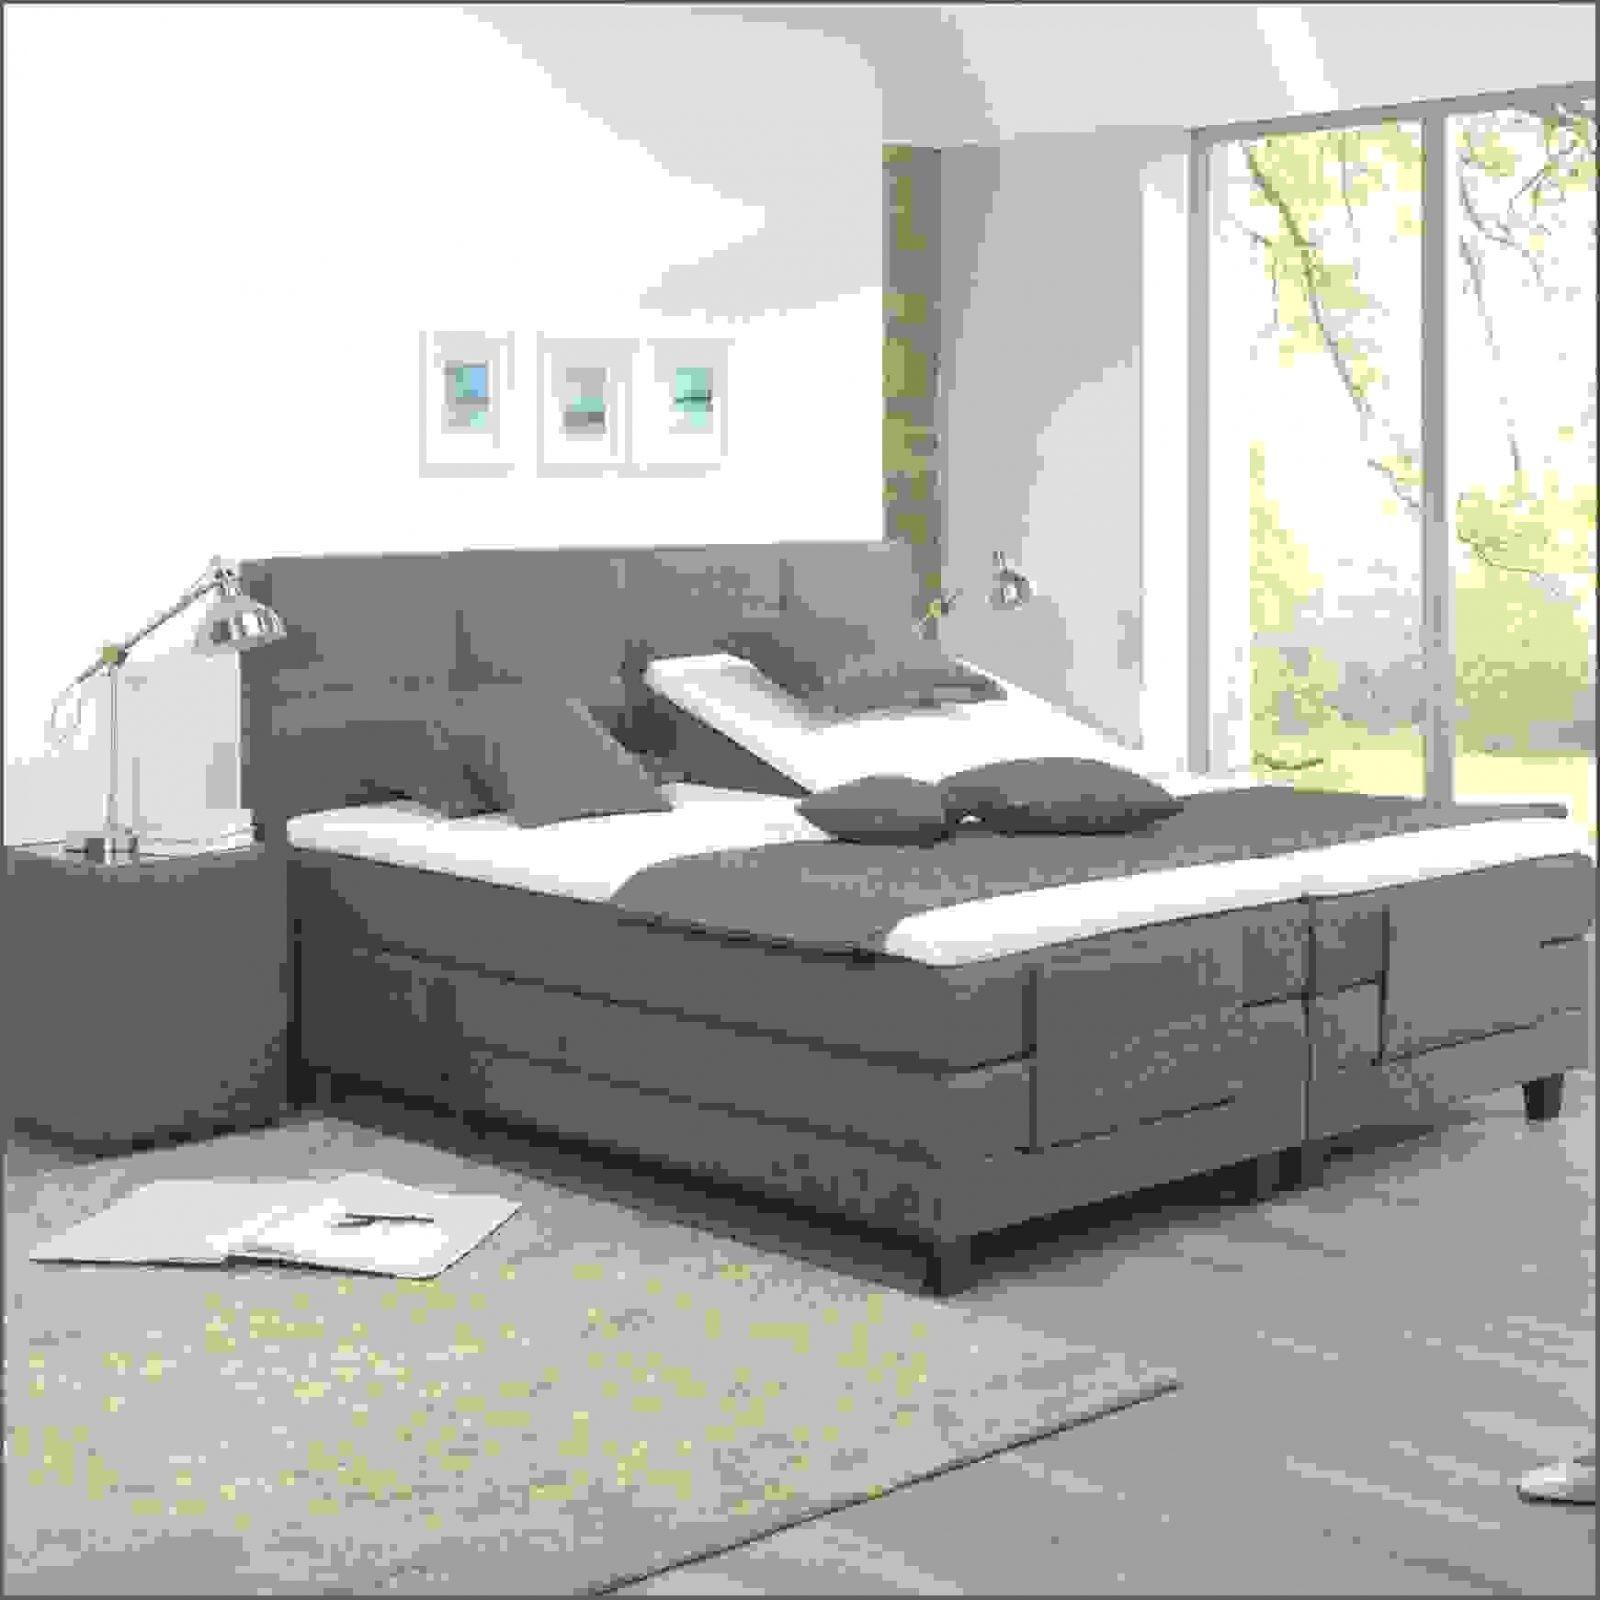 Boxspring Betten Line Kaufen Von Boxspringbett Vito Nice Konzept von Boxspringbett Vito Nice 180X200 Bild